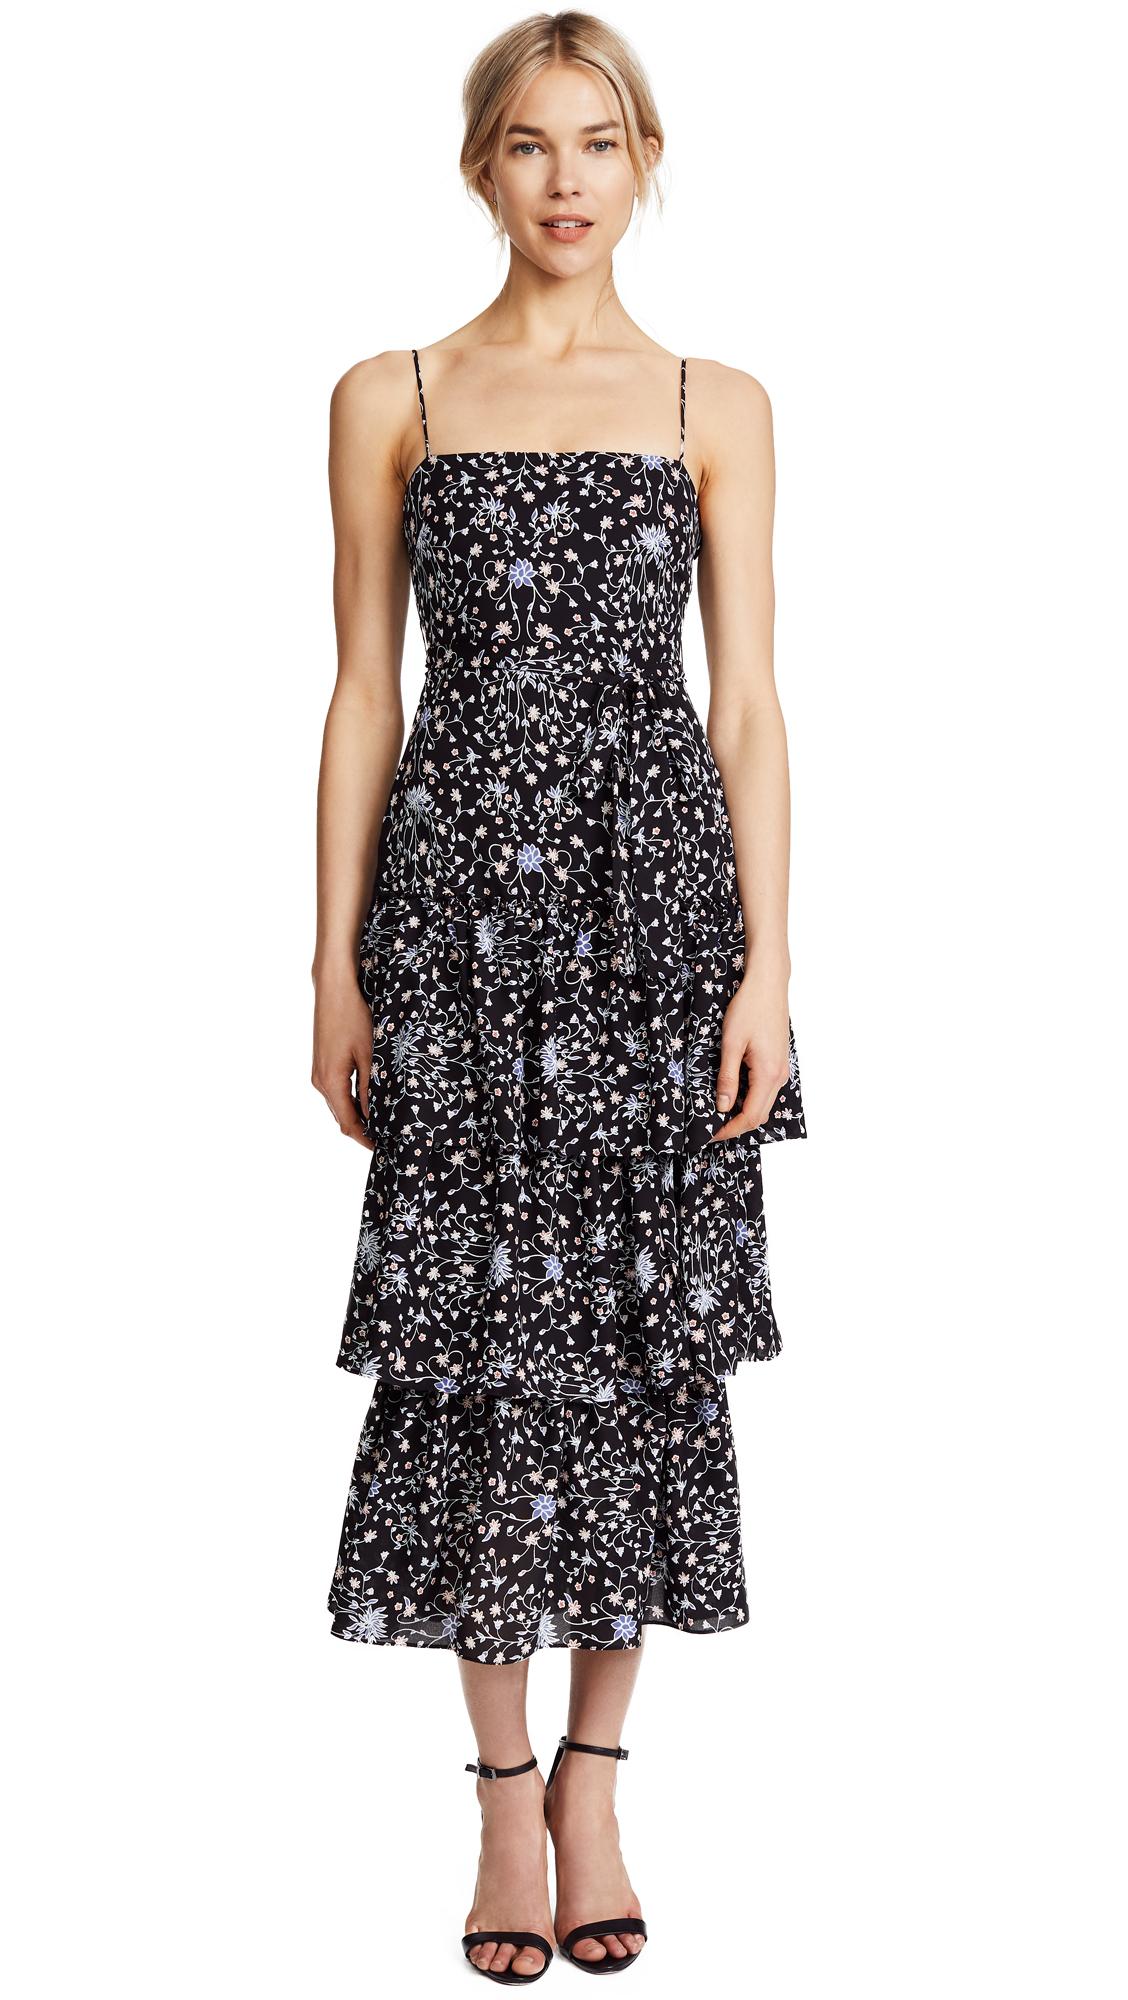 LIKELY Sorel Dress